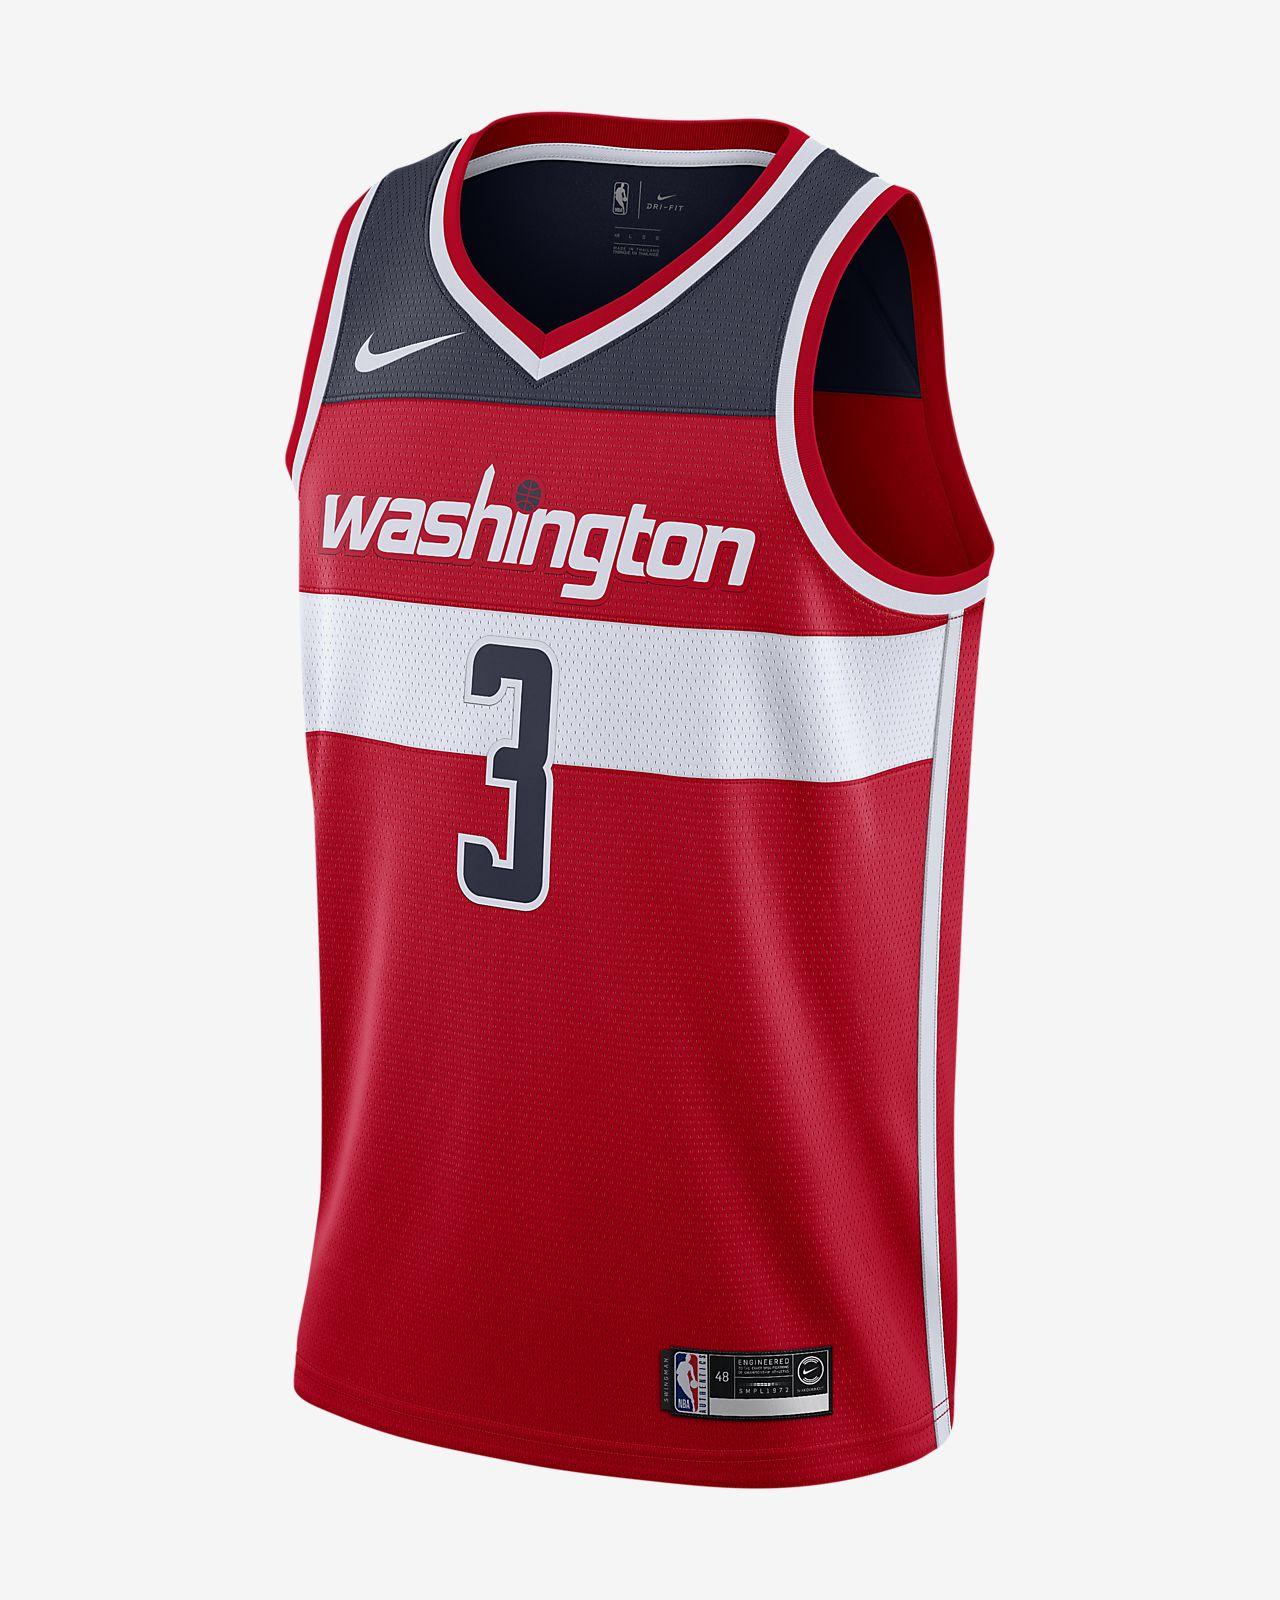 ad3423e0349 Men's Nike NBA Connected Jersey. Bradley Beal Icon Edition Swingman (Washington  Wizards)